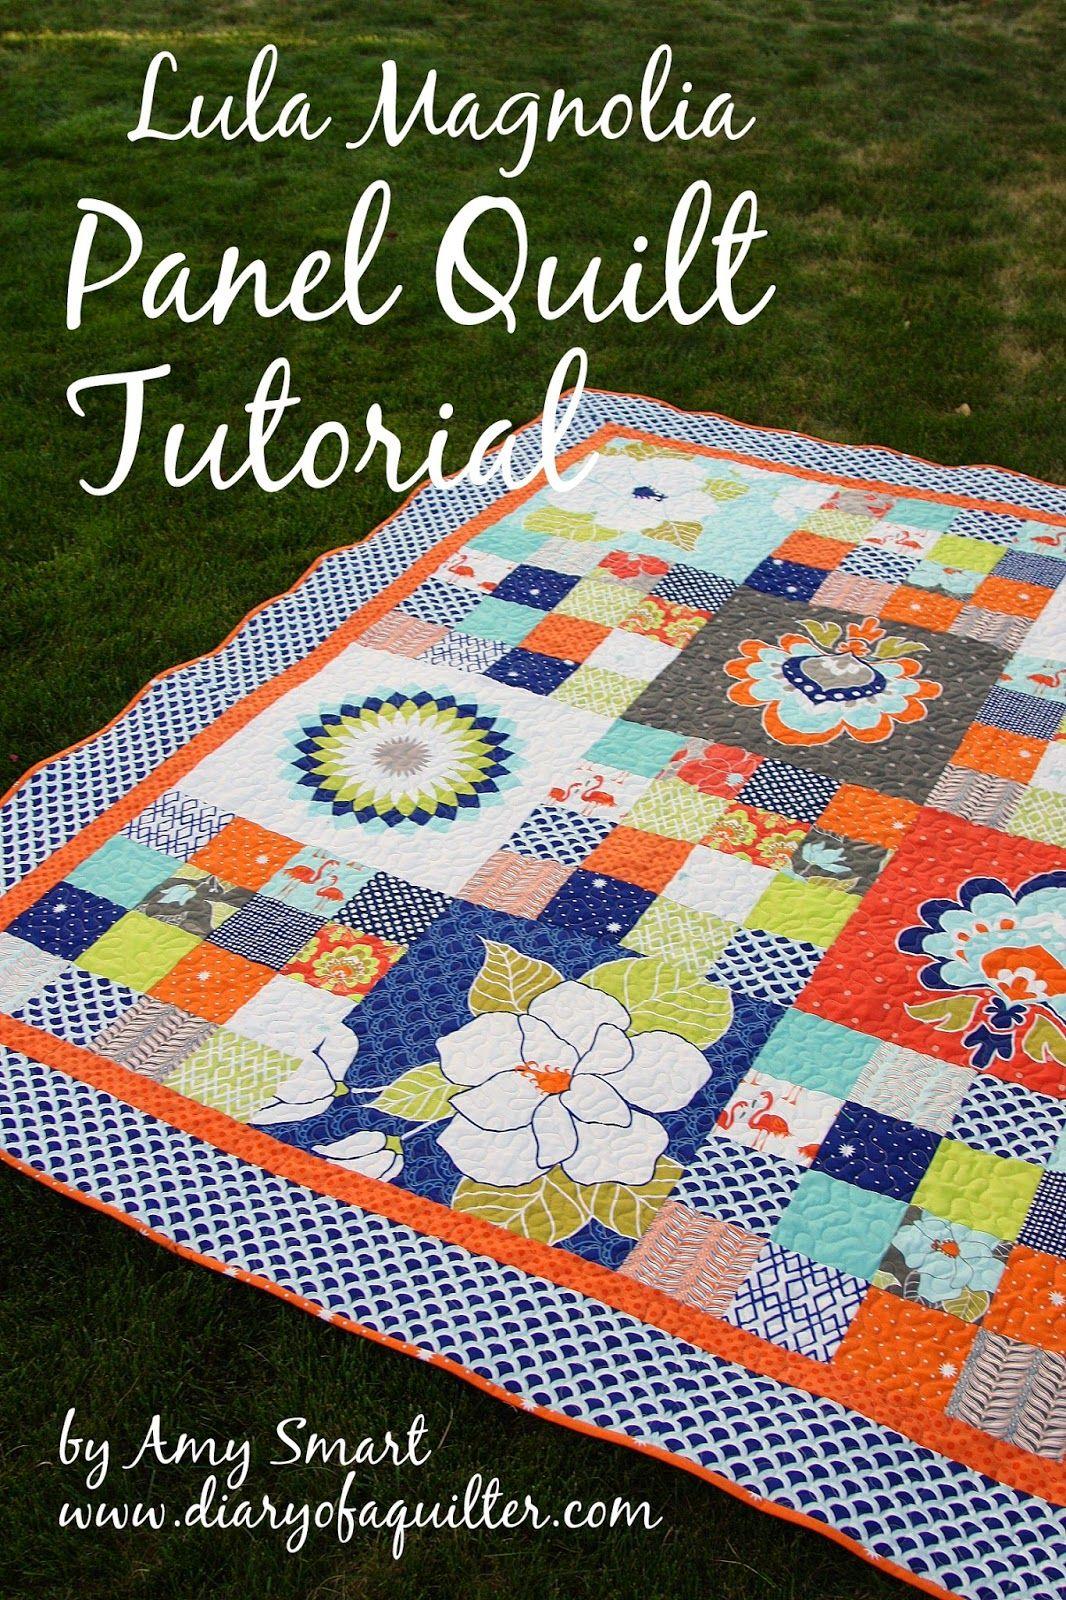 Riley Blake Designs Blog: Lula Magnolia Panel Quilt Tutorial #rileyblakedesigns #lulumagnolia #panel #quilt #tutorial #thequiltedfish